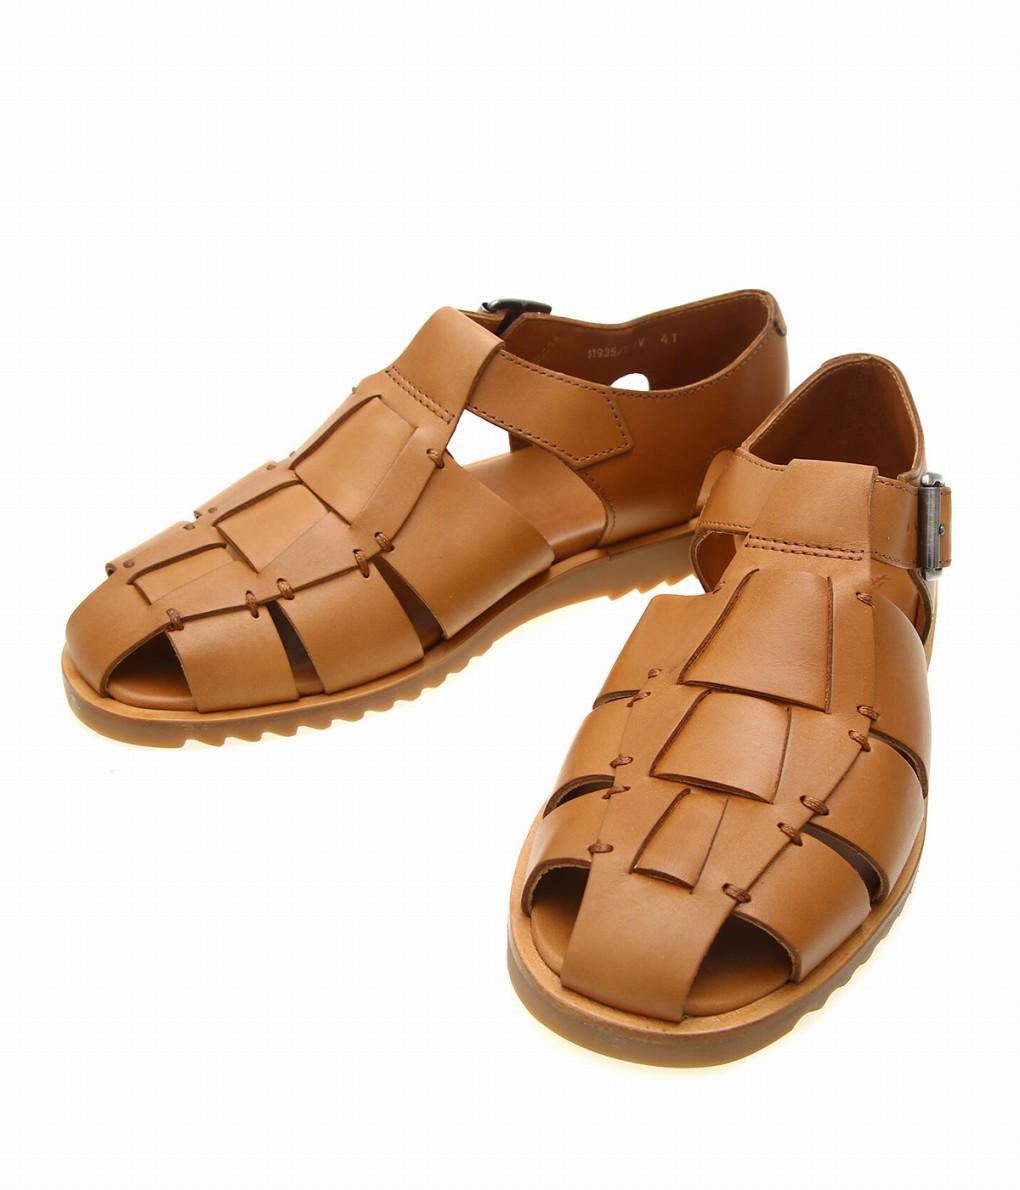 paraboot / パラブーツ : PACIFIC-Cuir Lisse smooth- : パシフィック サンダル 靴 メンズ : 123303【MUS】